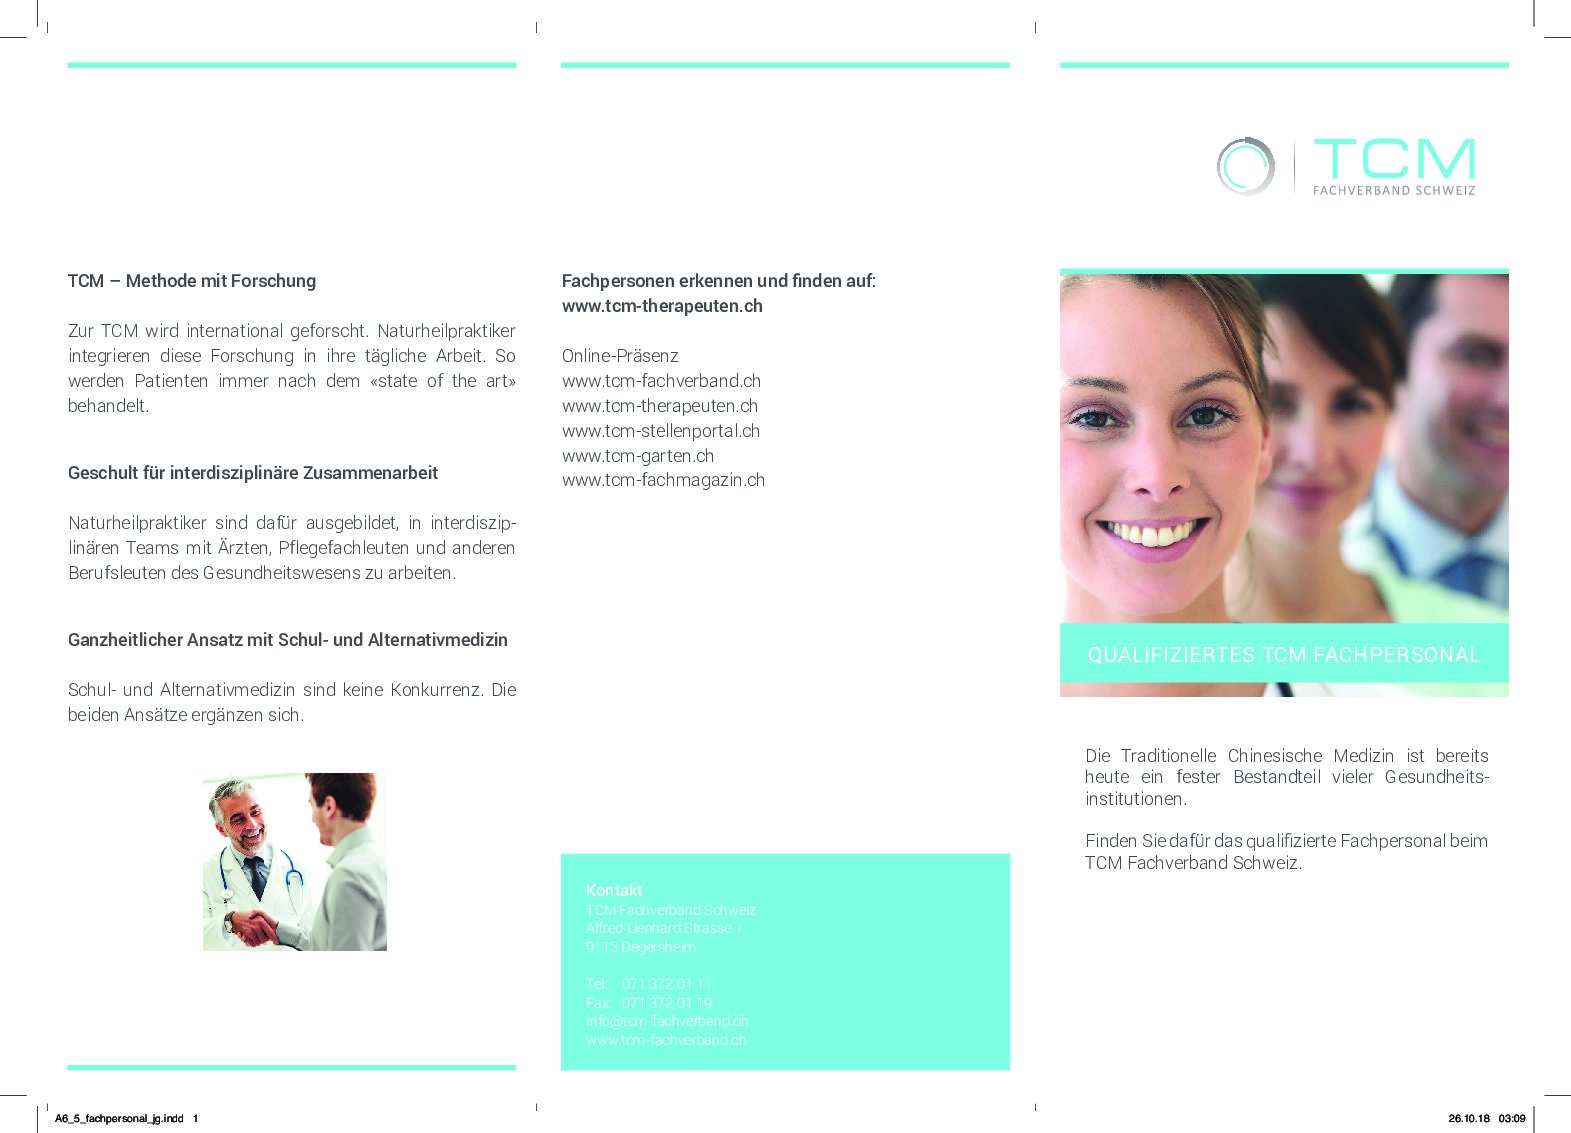 Merkblatt/Faltflyer: Qualifiziertes TCM Fachpersonal